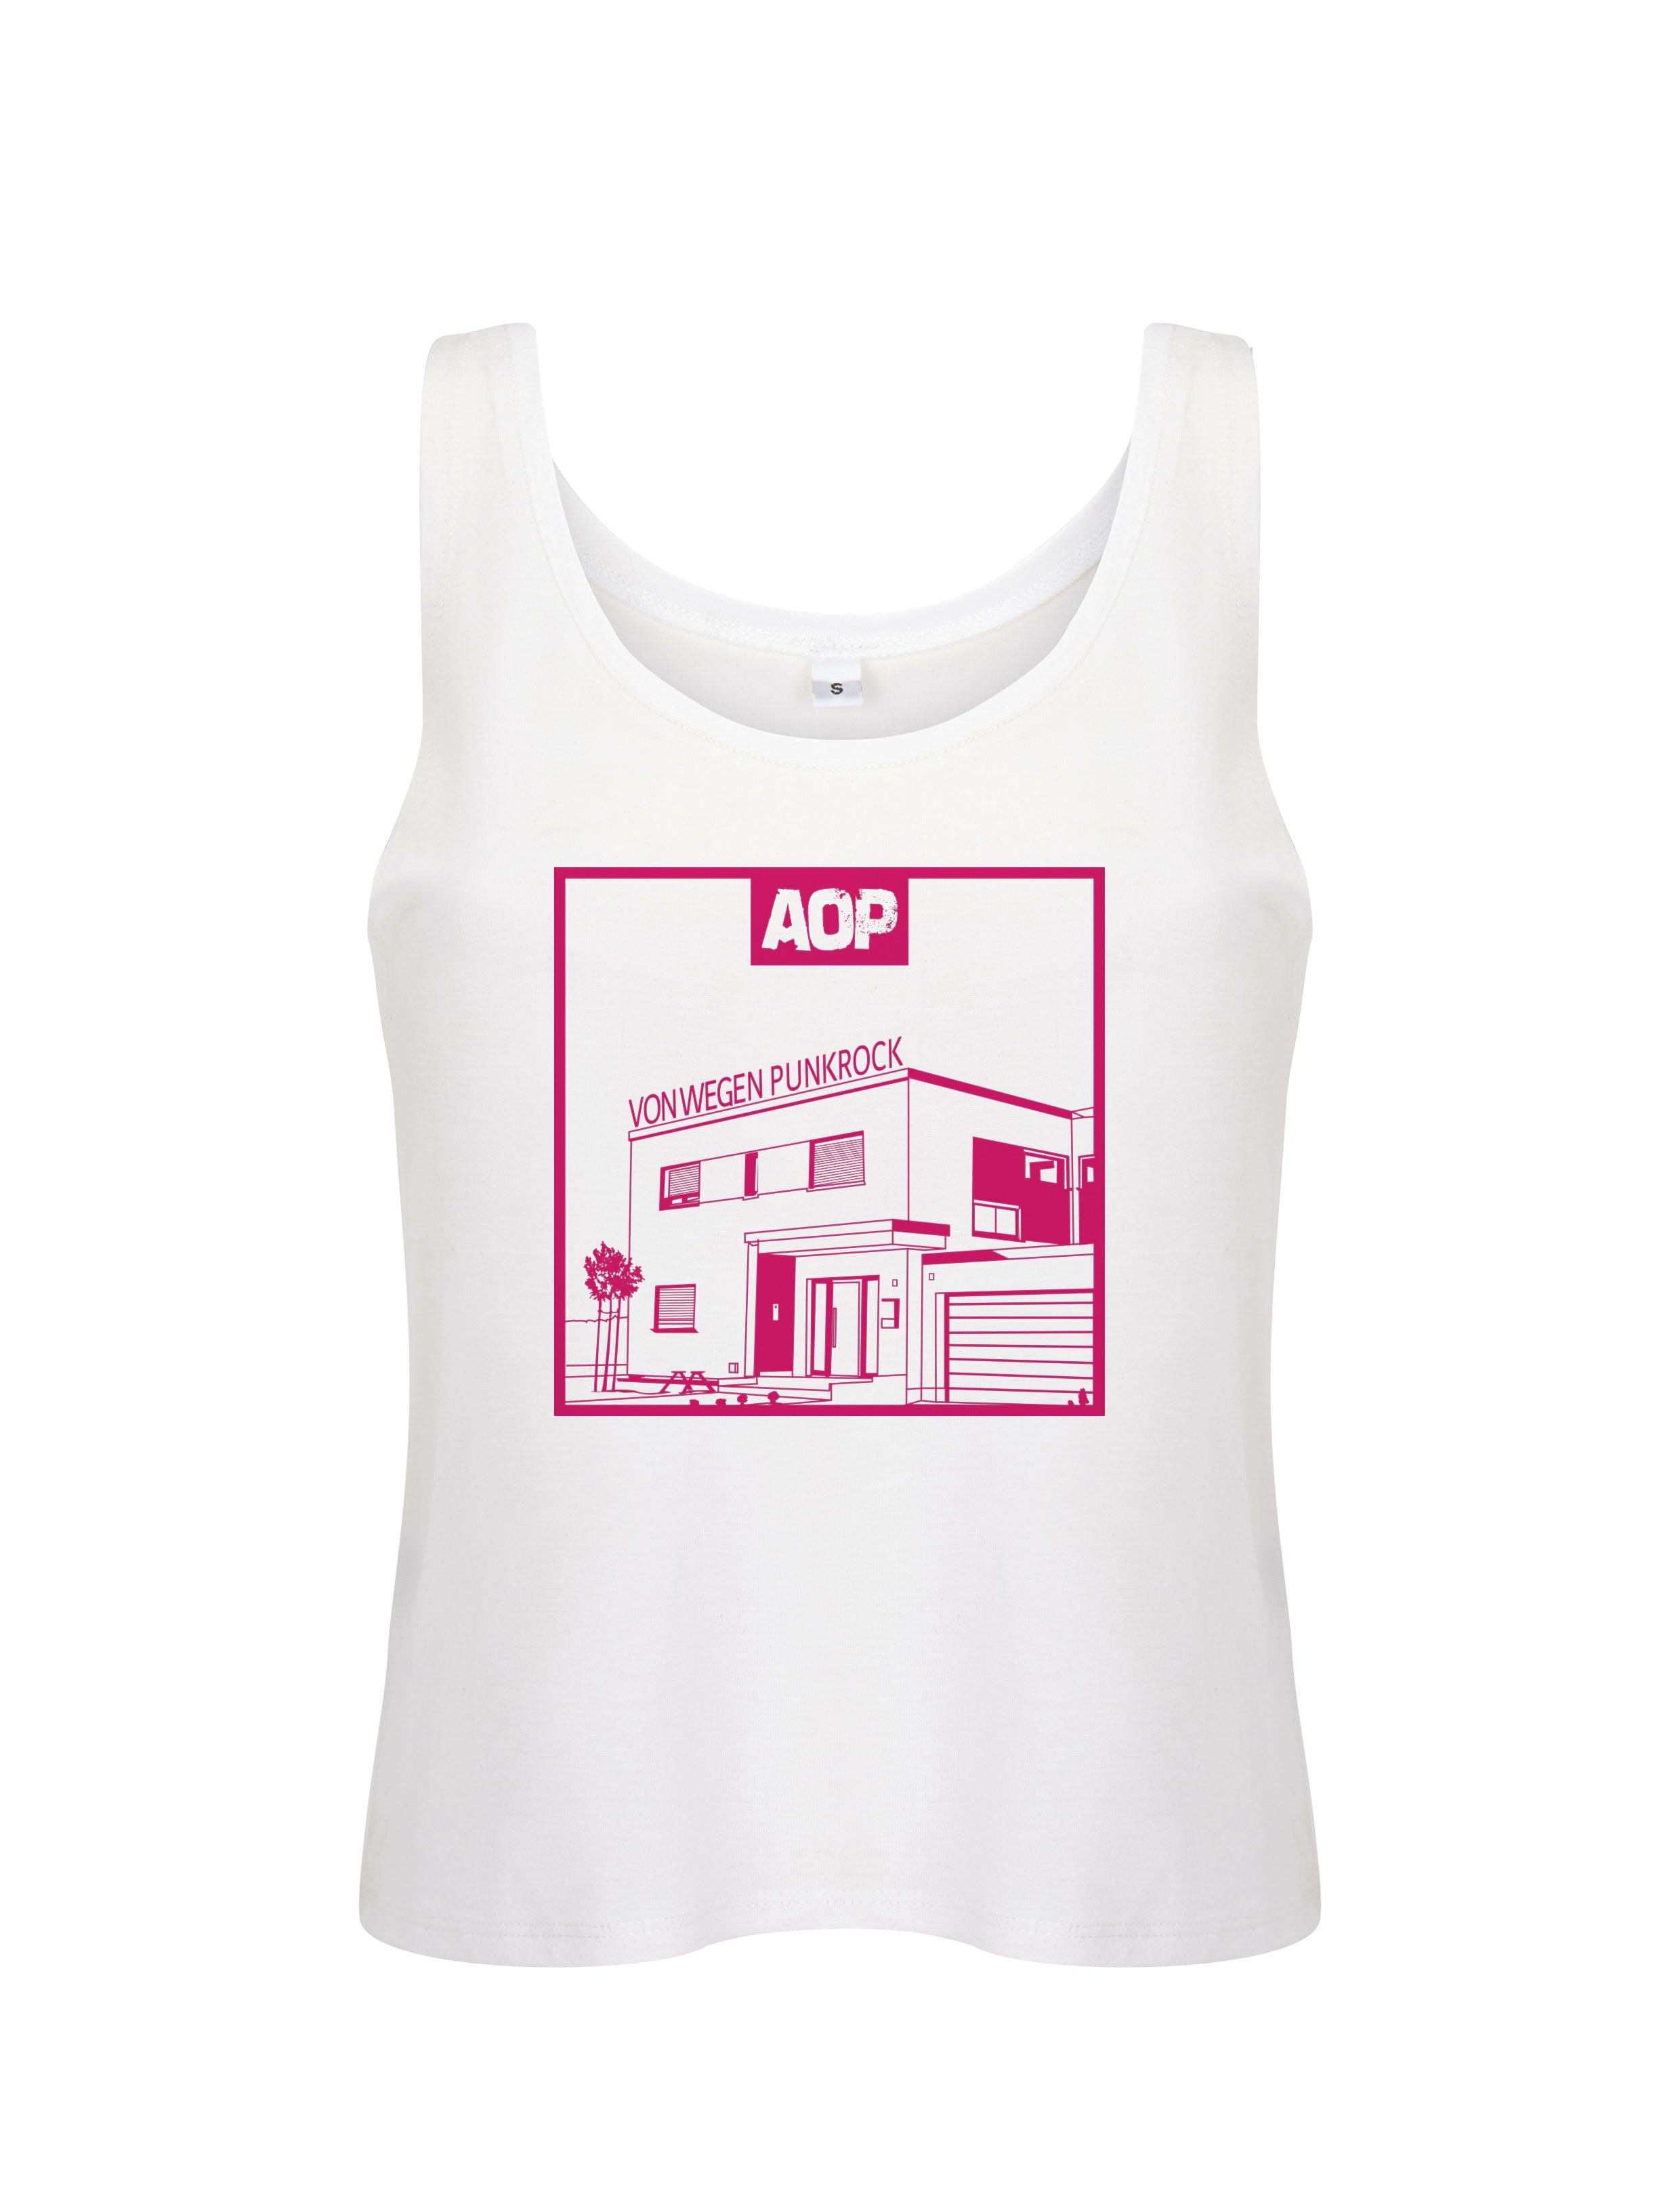 AOP – Von wegen Punkrock – Girlie-Top (weiß)